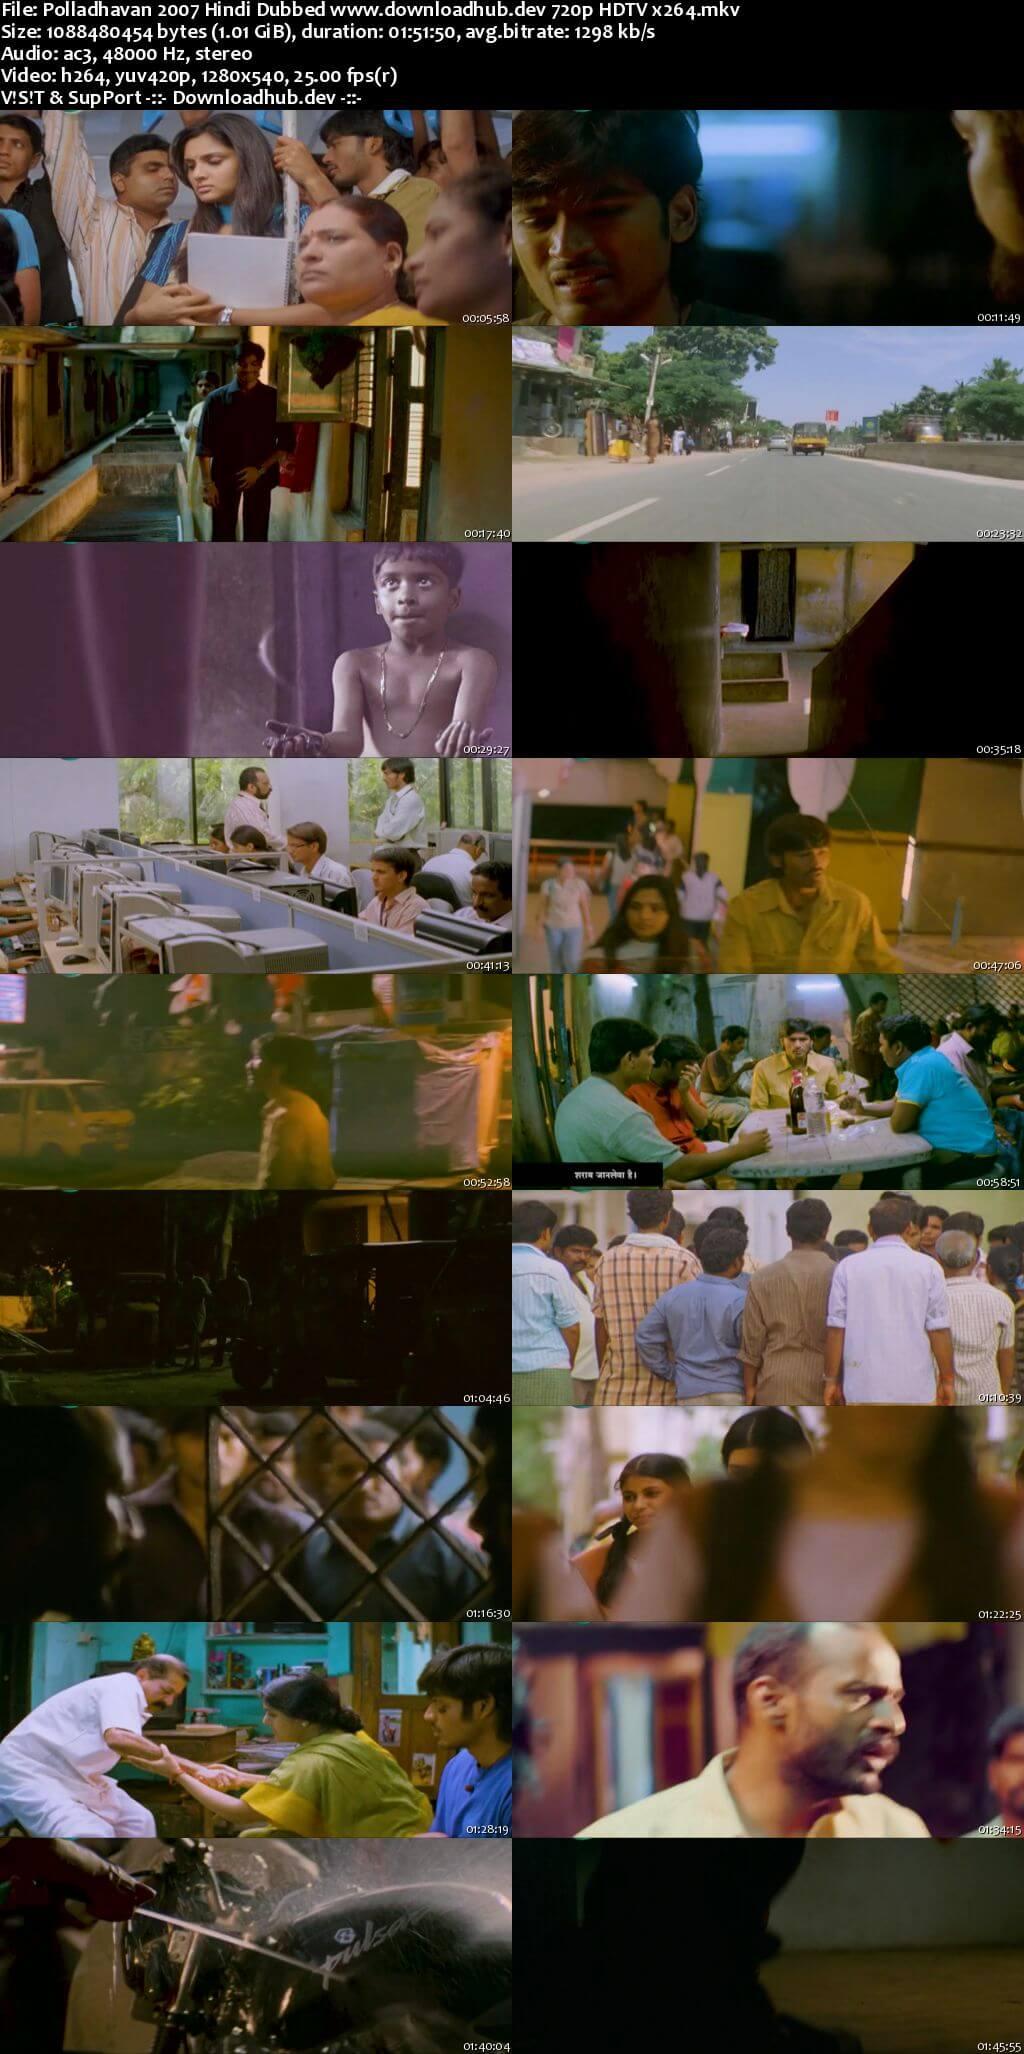 Polladhavan 2007 Hindi Dubbed 720p HDTV x264